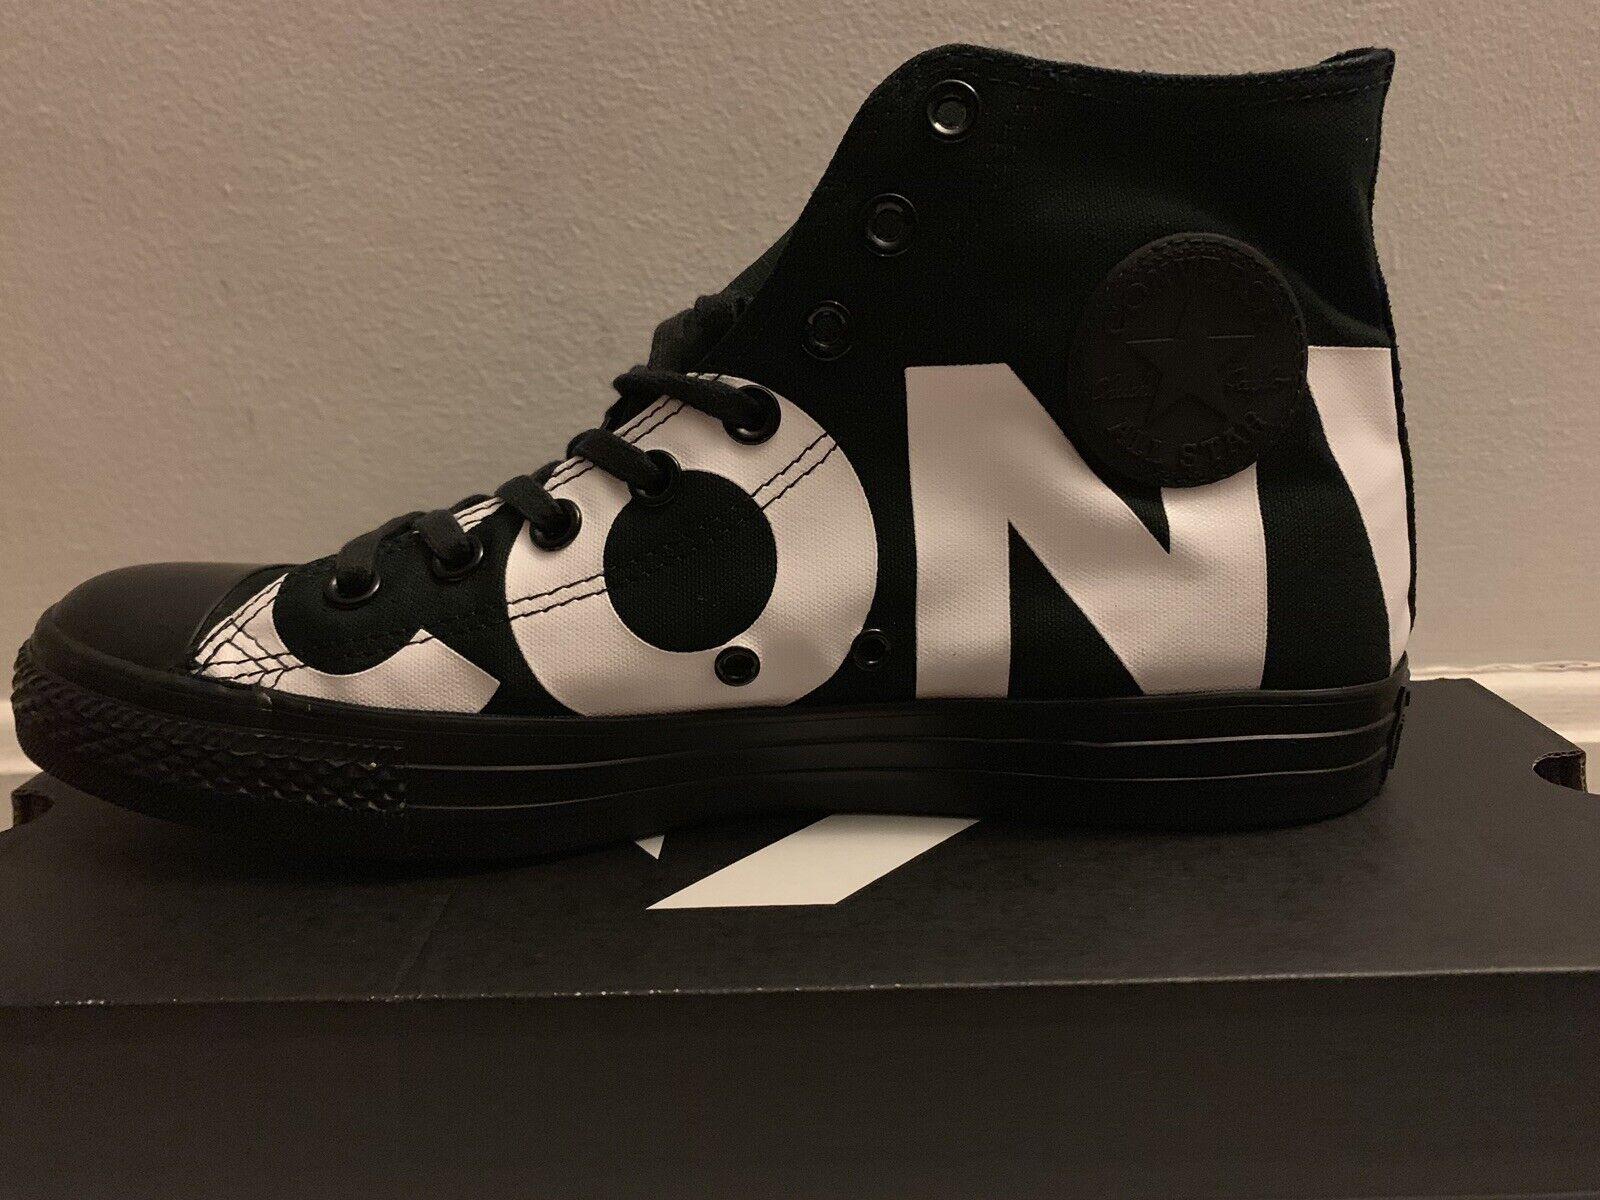 Converse Chuck Taylor Star Hi Zapatillas Negro All 160887F blancoo Talla 10 para hombre